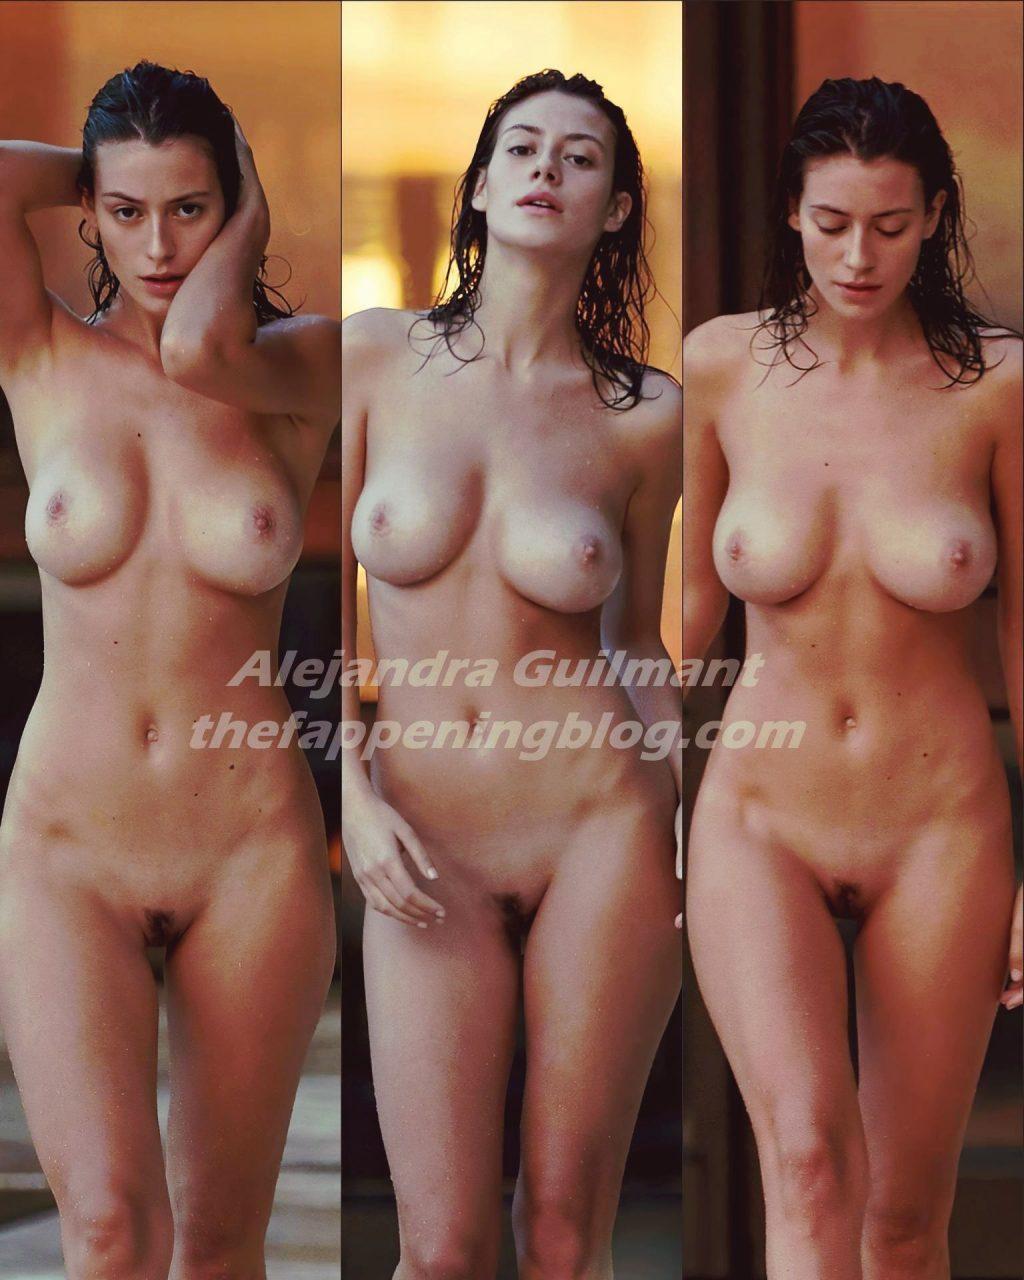 Alejandra Guilmant Nude (1 Collage Photo)